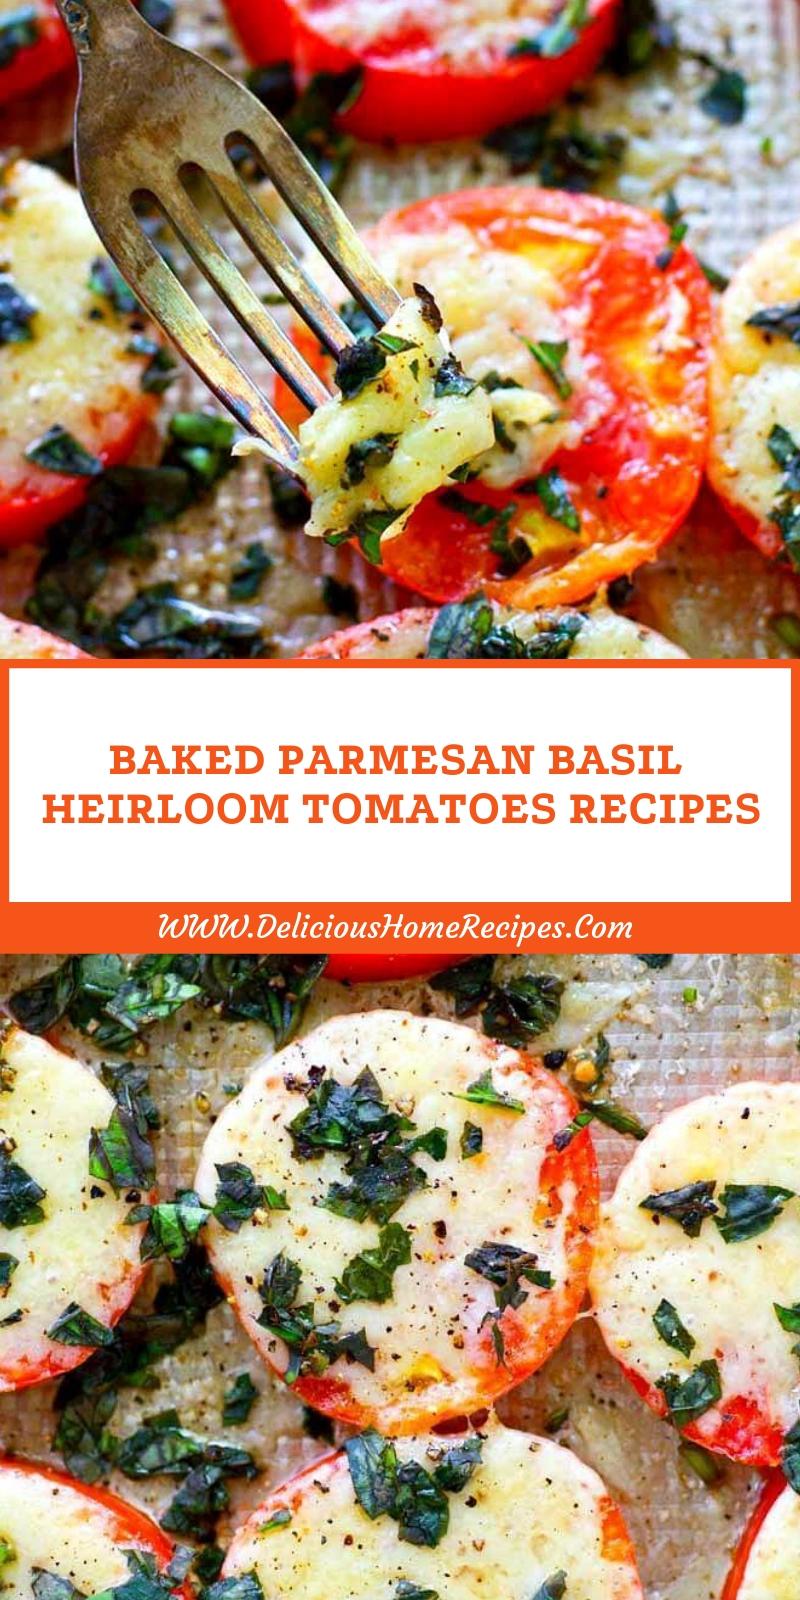 Baked Parmesan Basil Heirloom Tomatoes Recipes